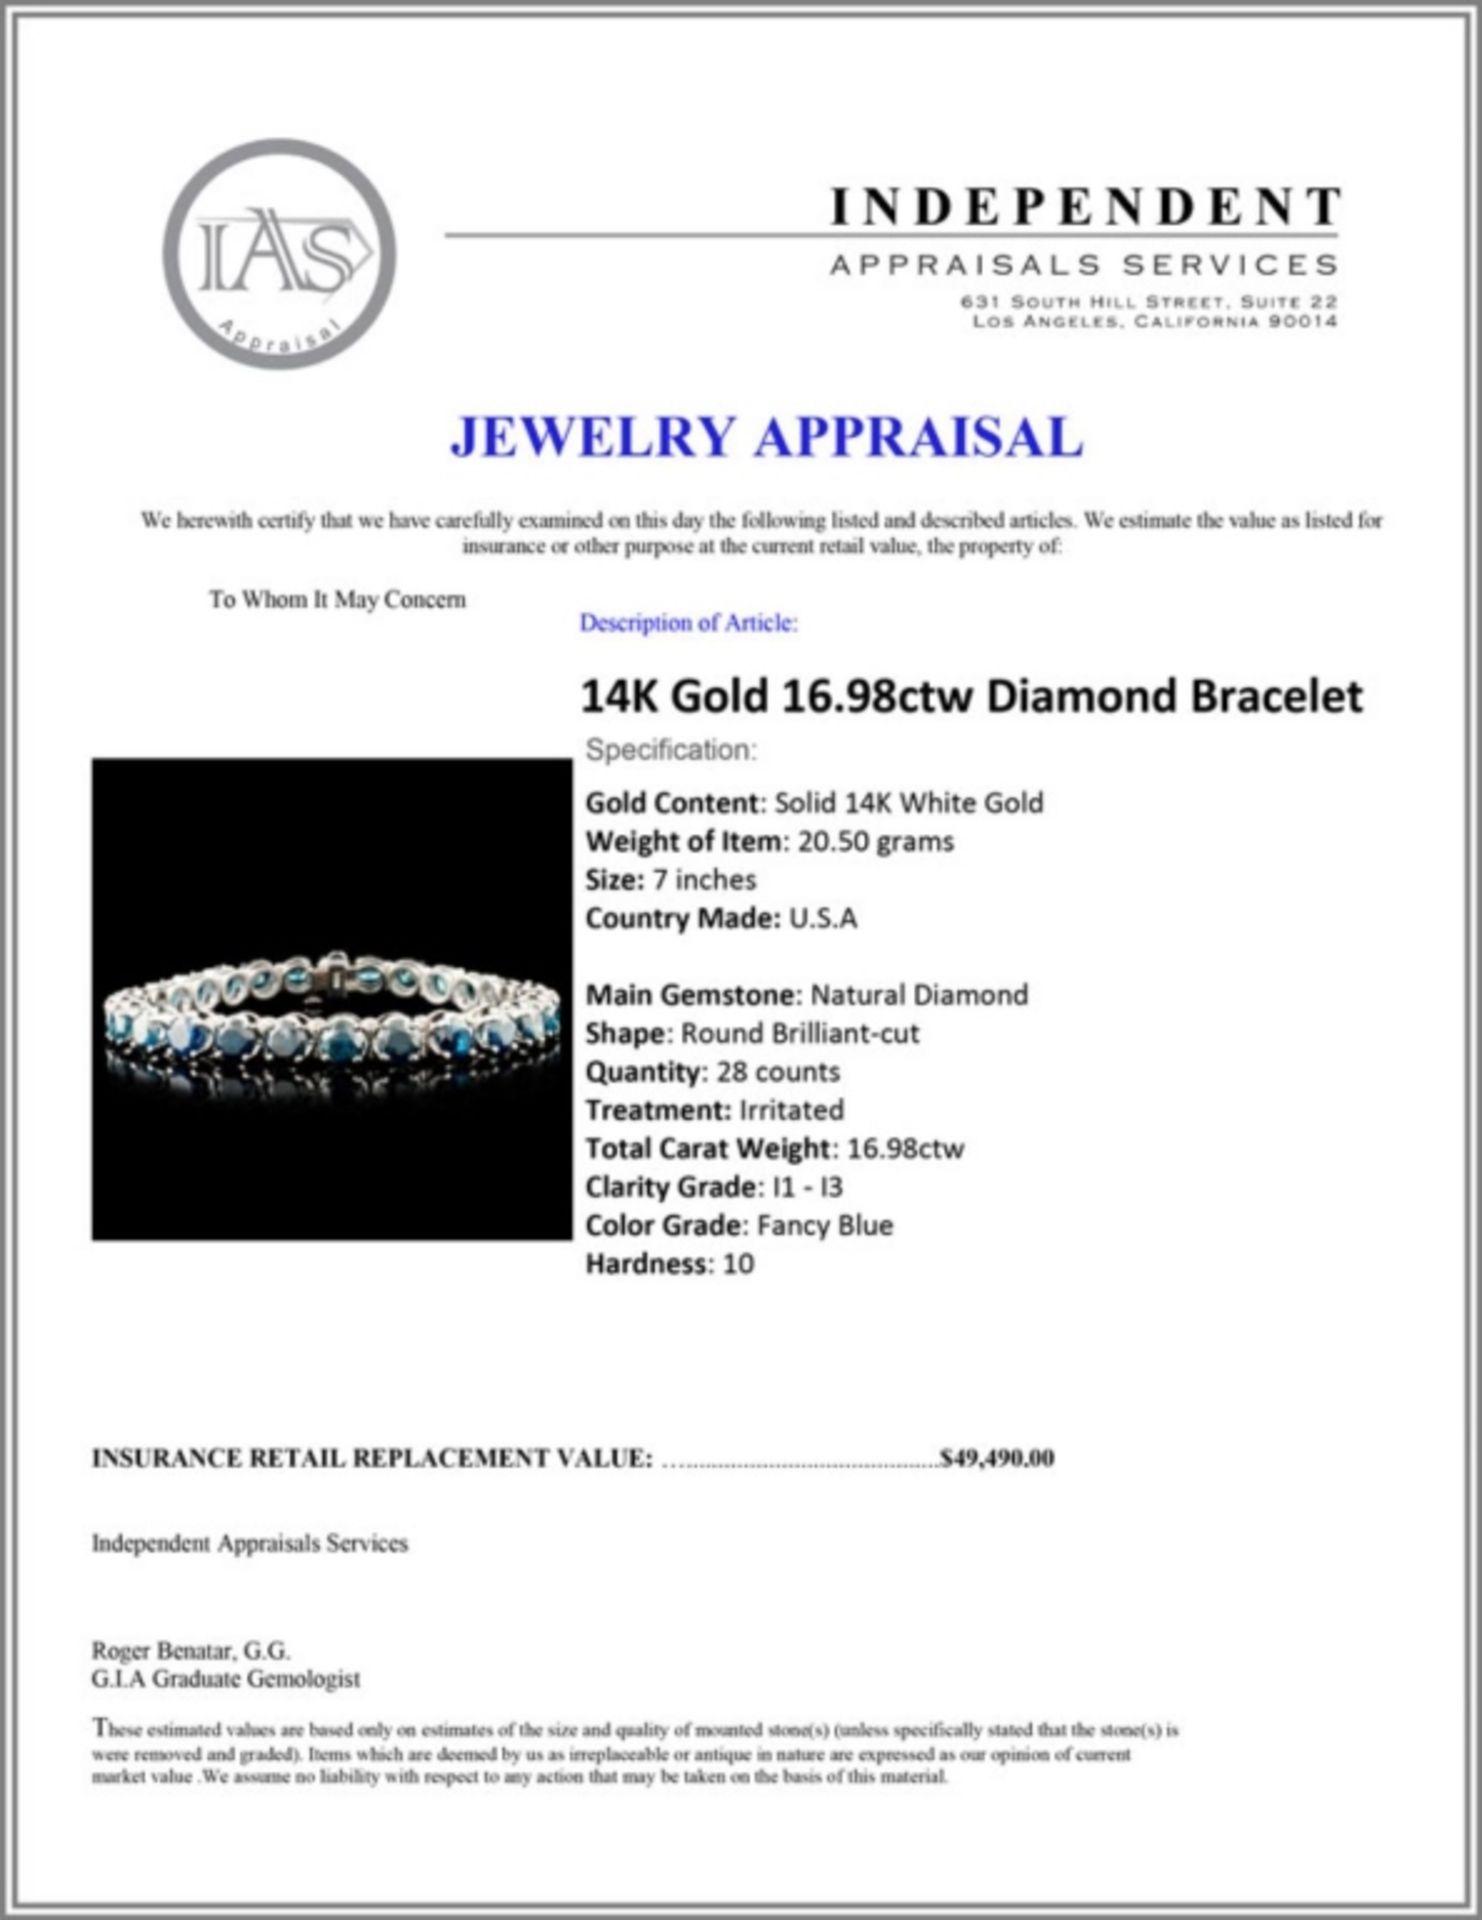 14K Gold 16.98ctw Tennis Diamond Bracelet - Image 4 of 4